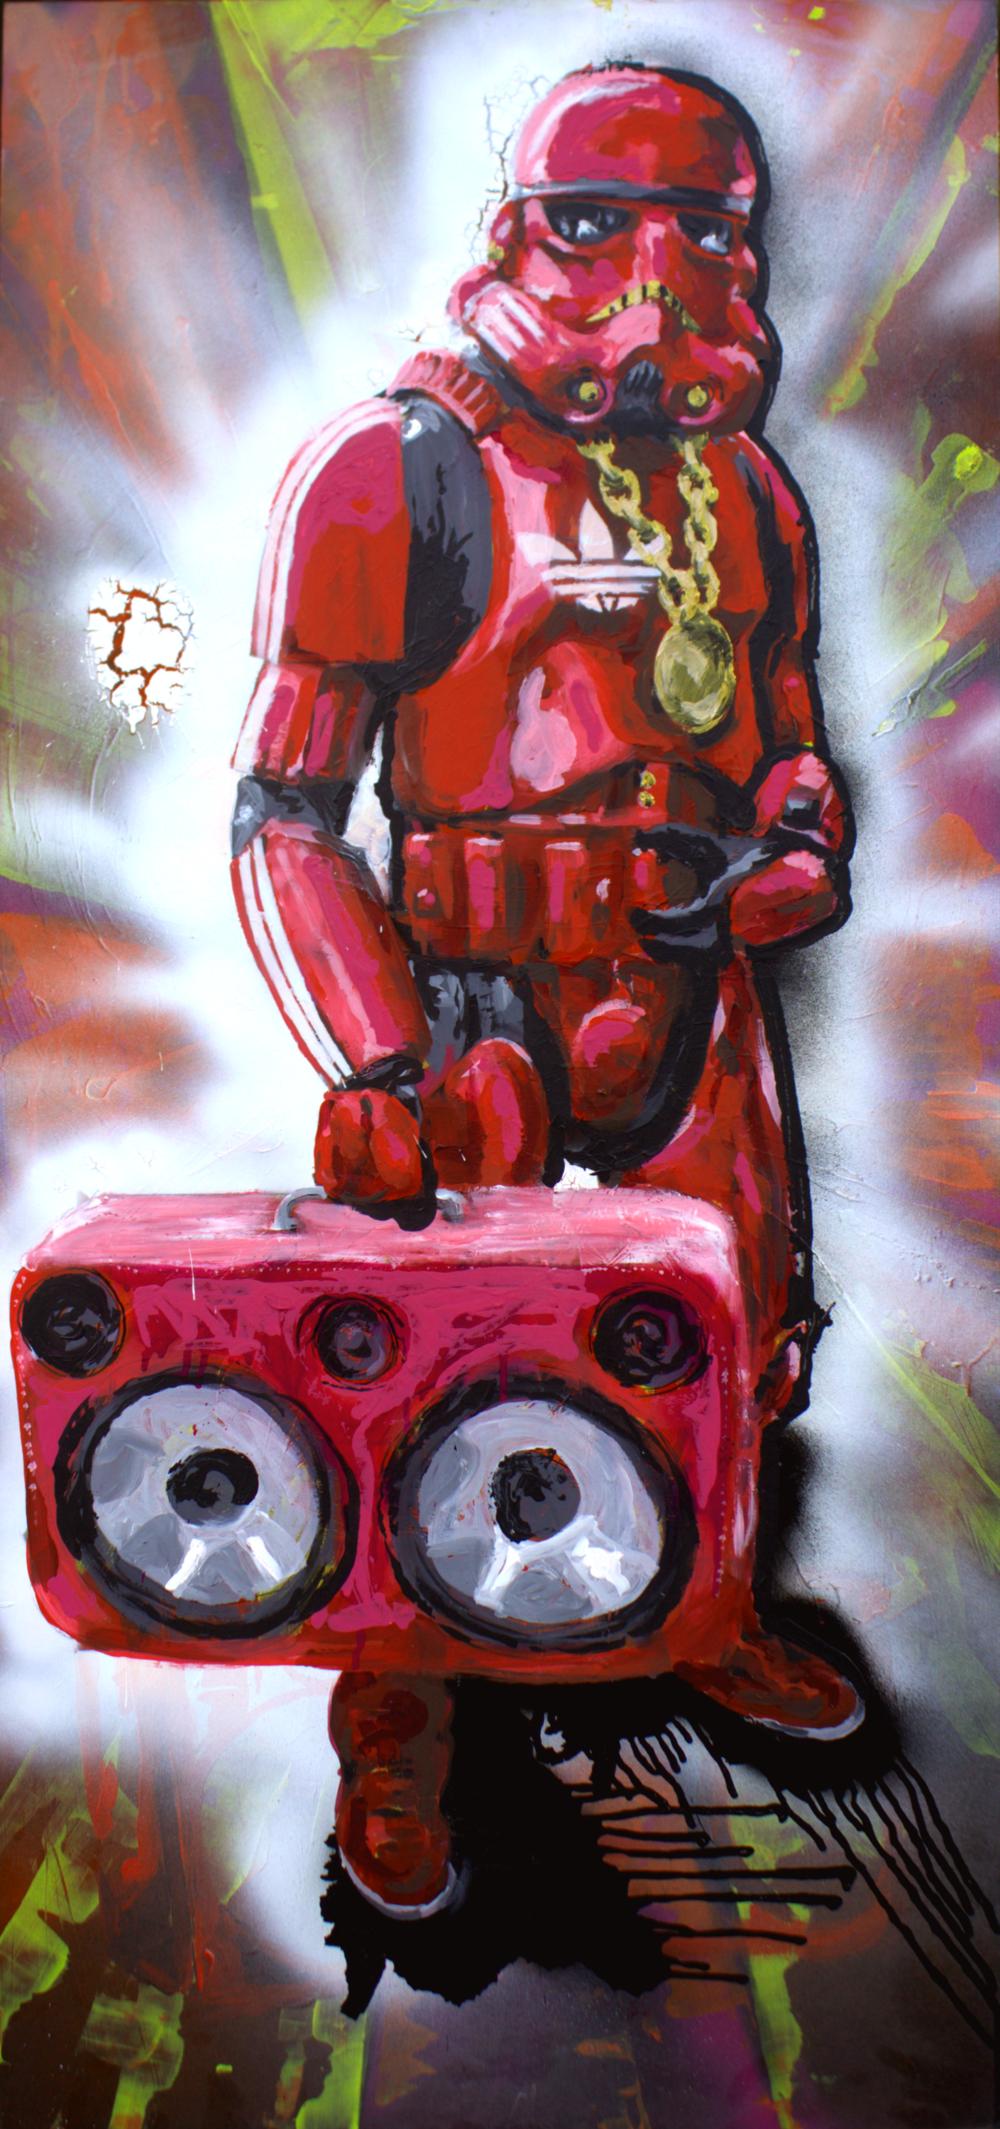 Tribe called R.E.D. acryl on 55 x 120 woodfibre 2016 Budapest 55x120cm  125'000 HUF